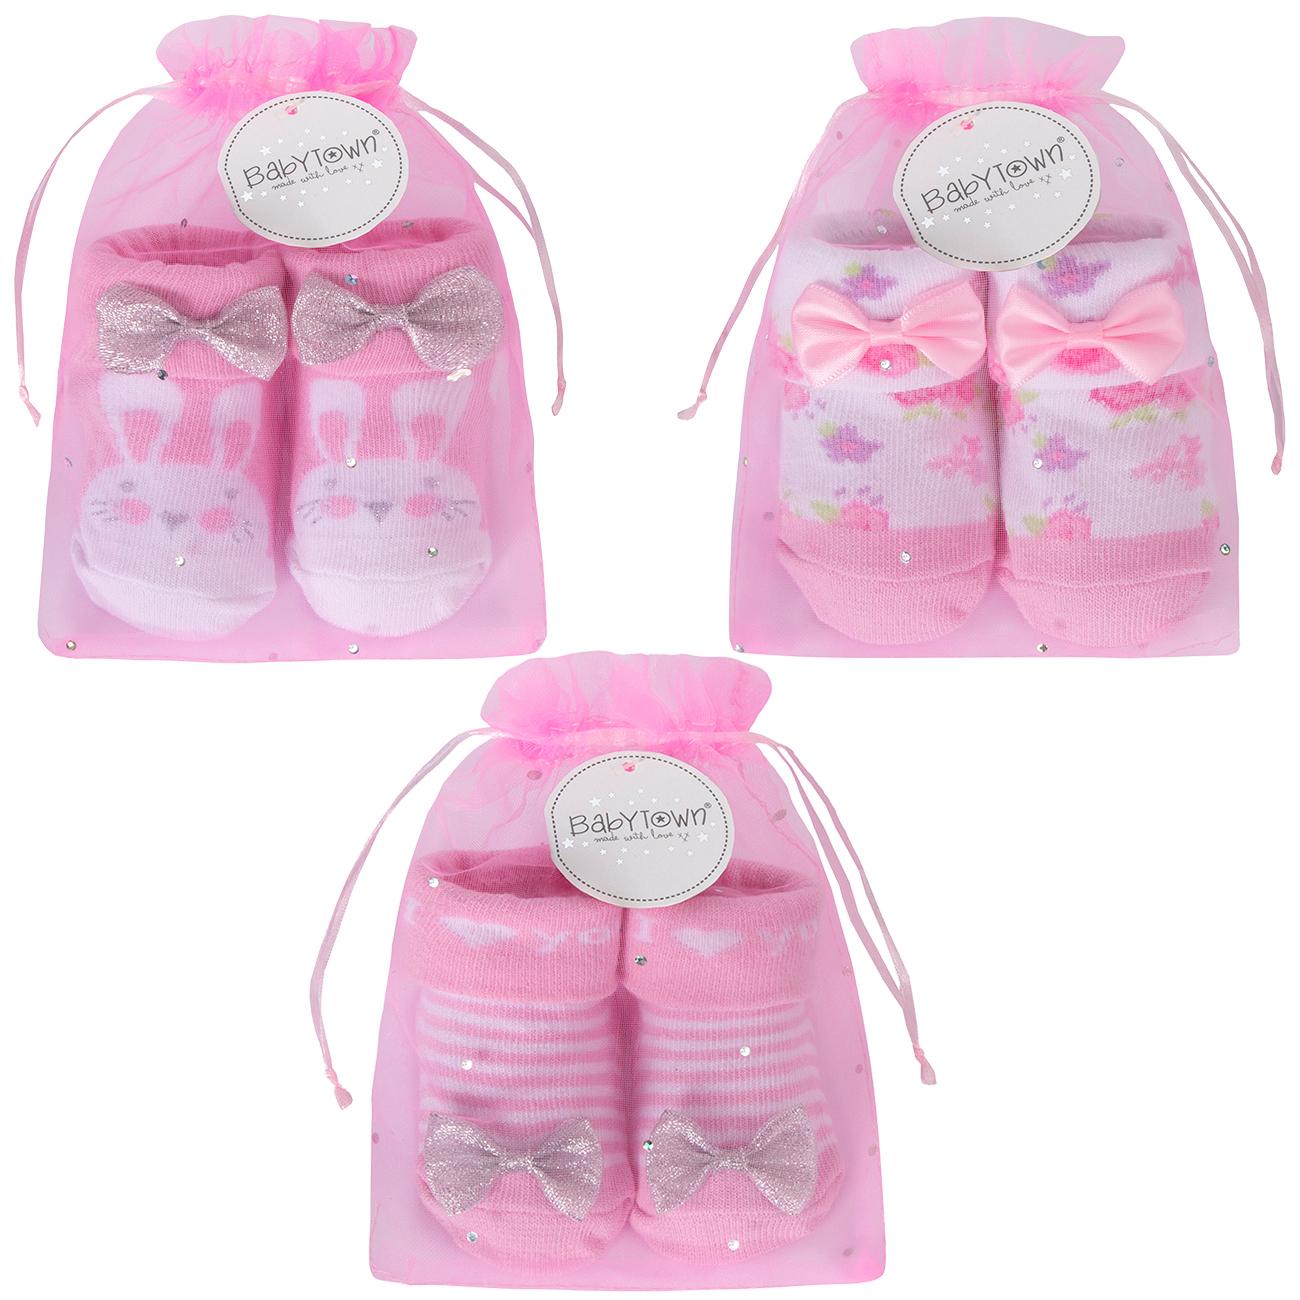 BabyTown Baby Girls Pink Novelty Print Socks /& Headband Set